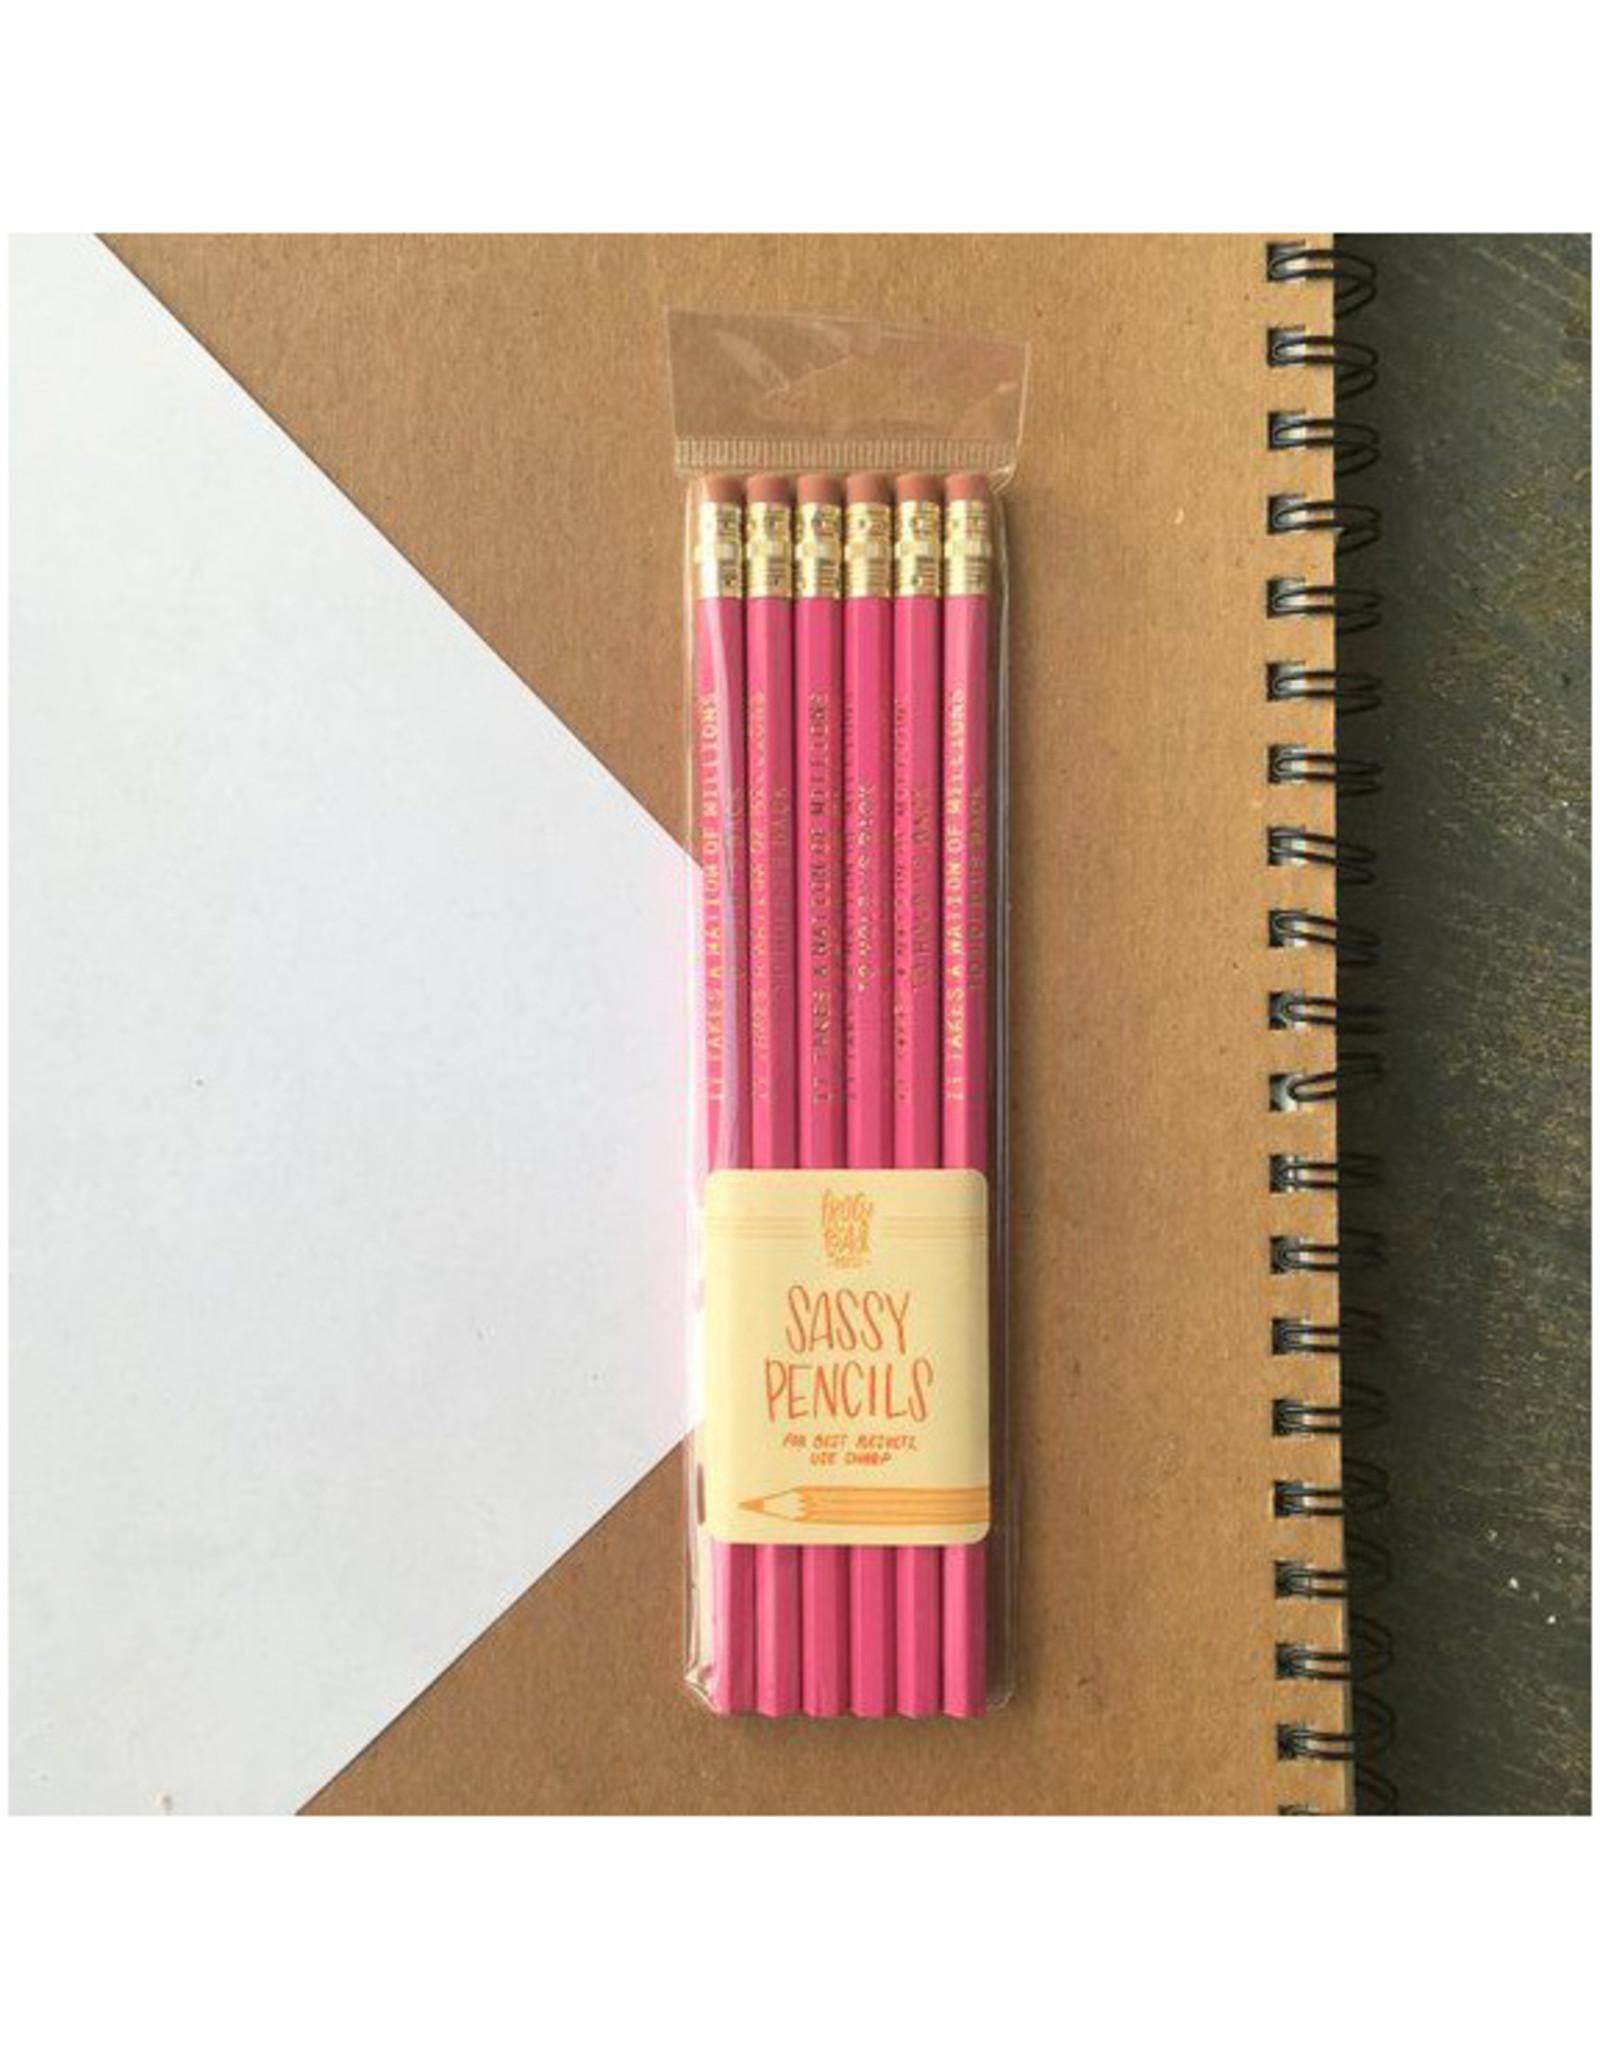 Public Enemy Pencils Set of 6